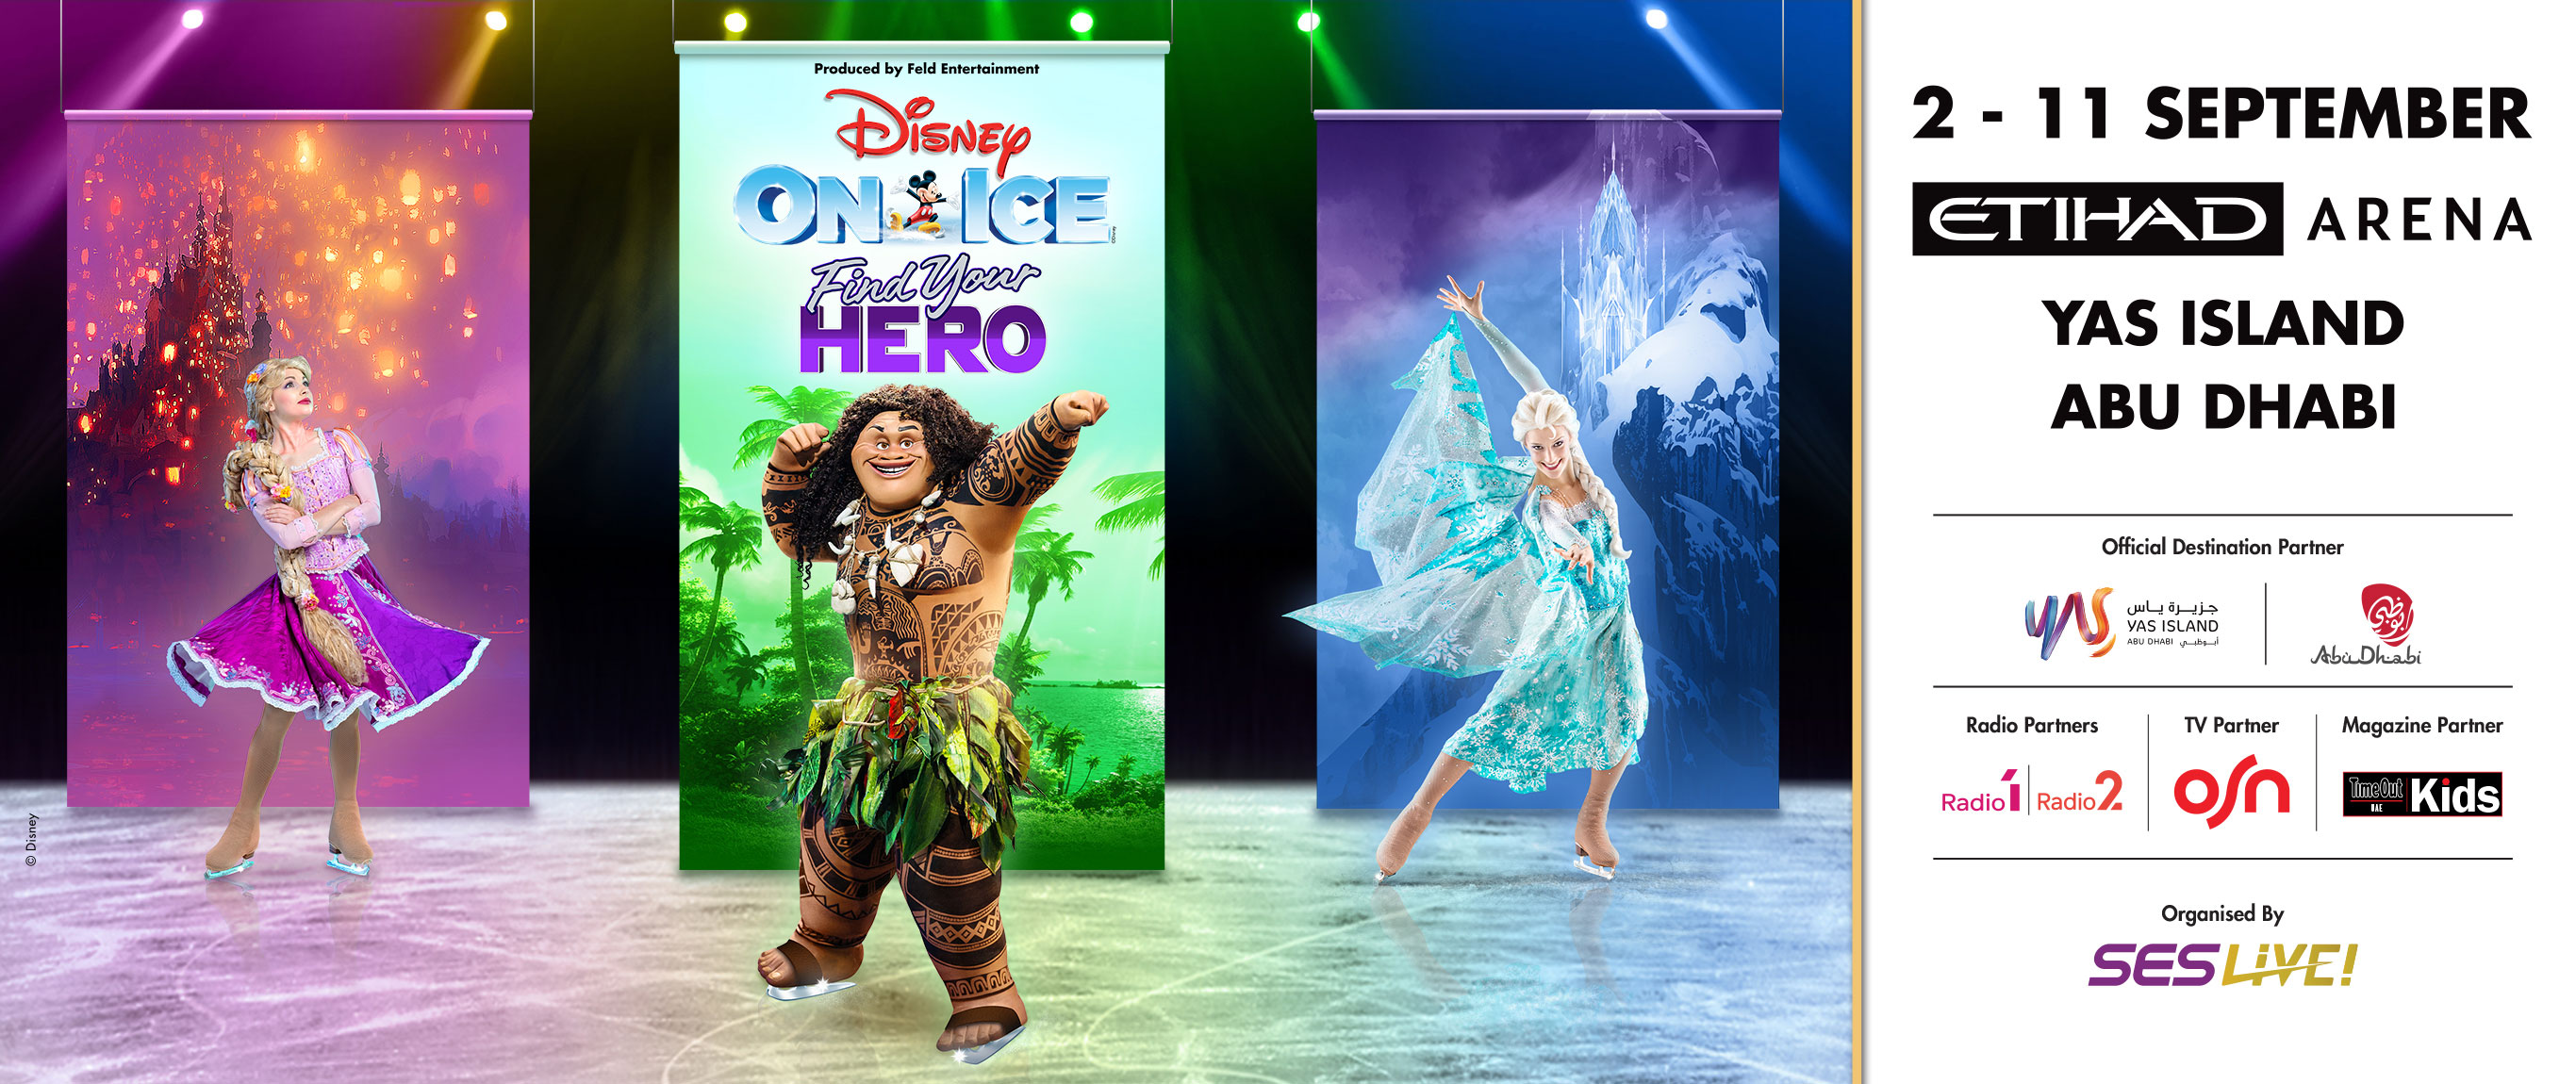 Disney On Ice presents Find your Hero